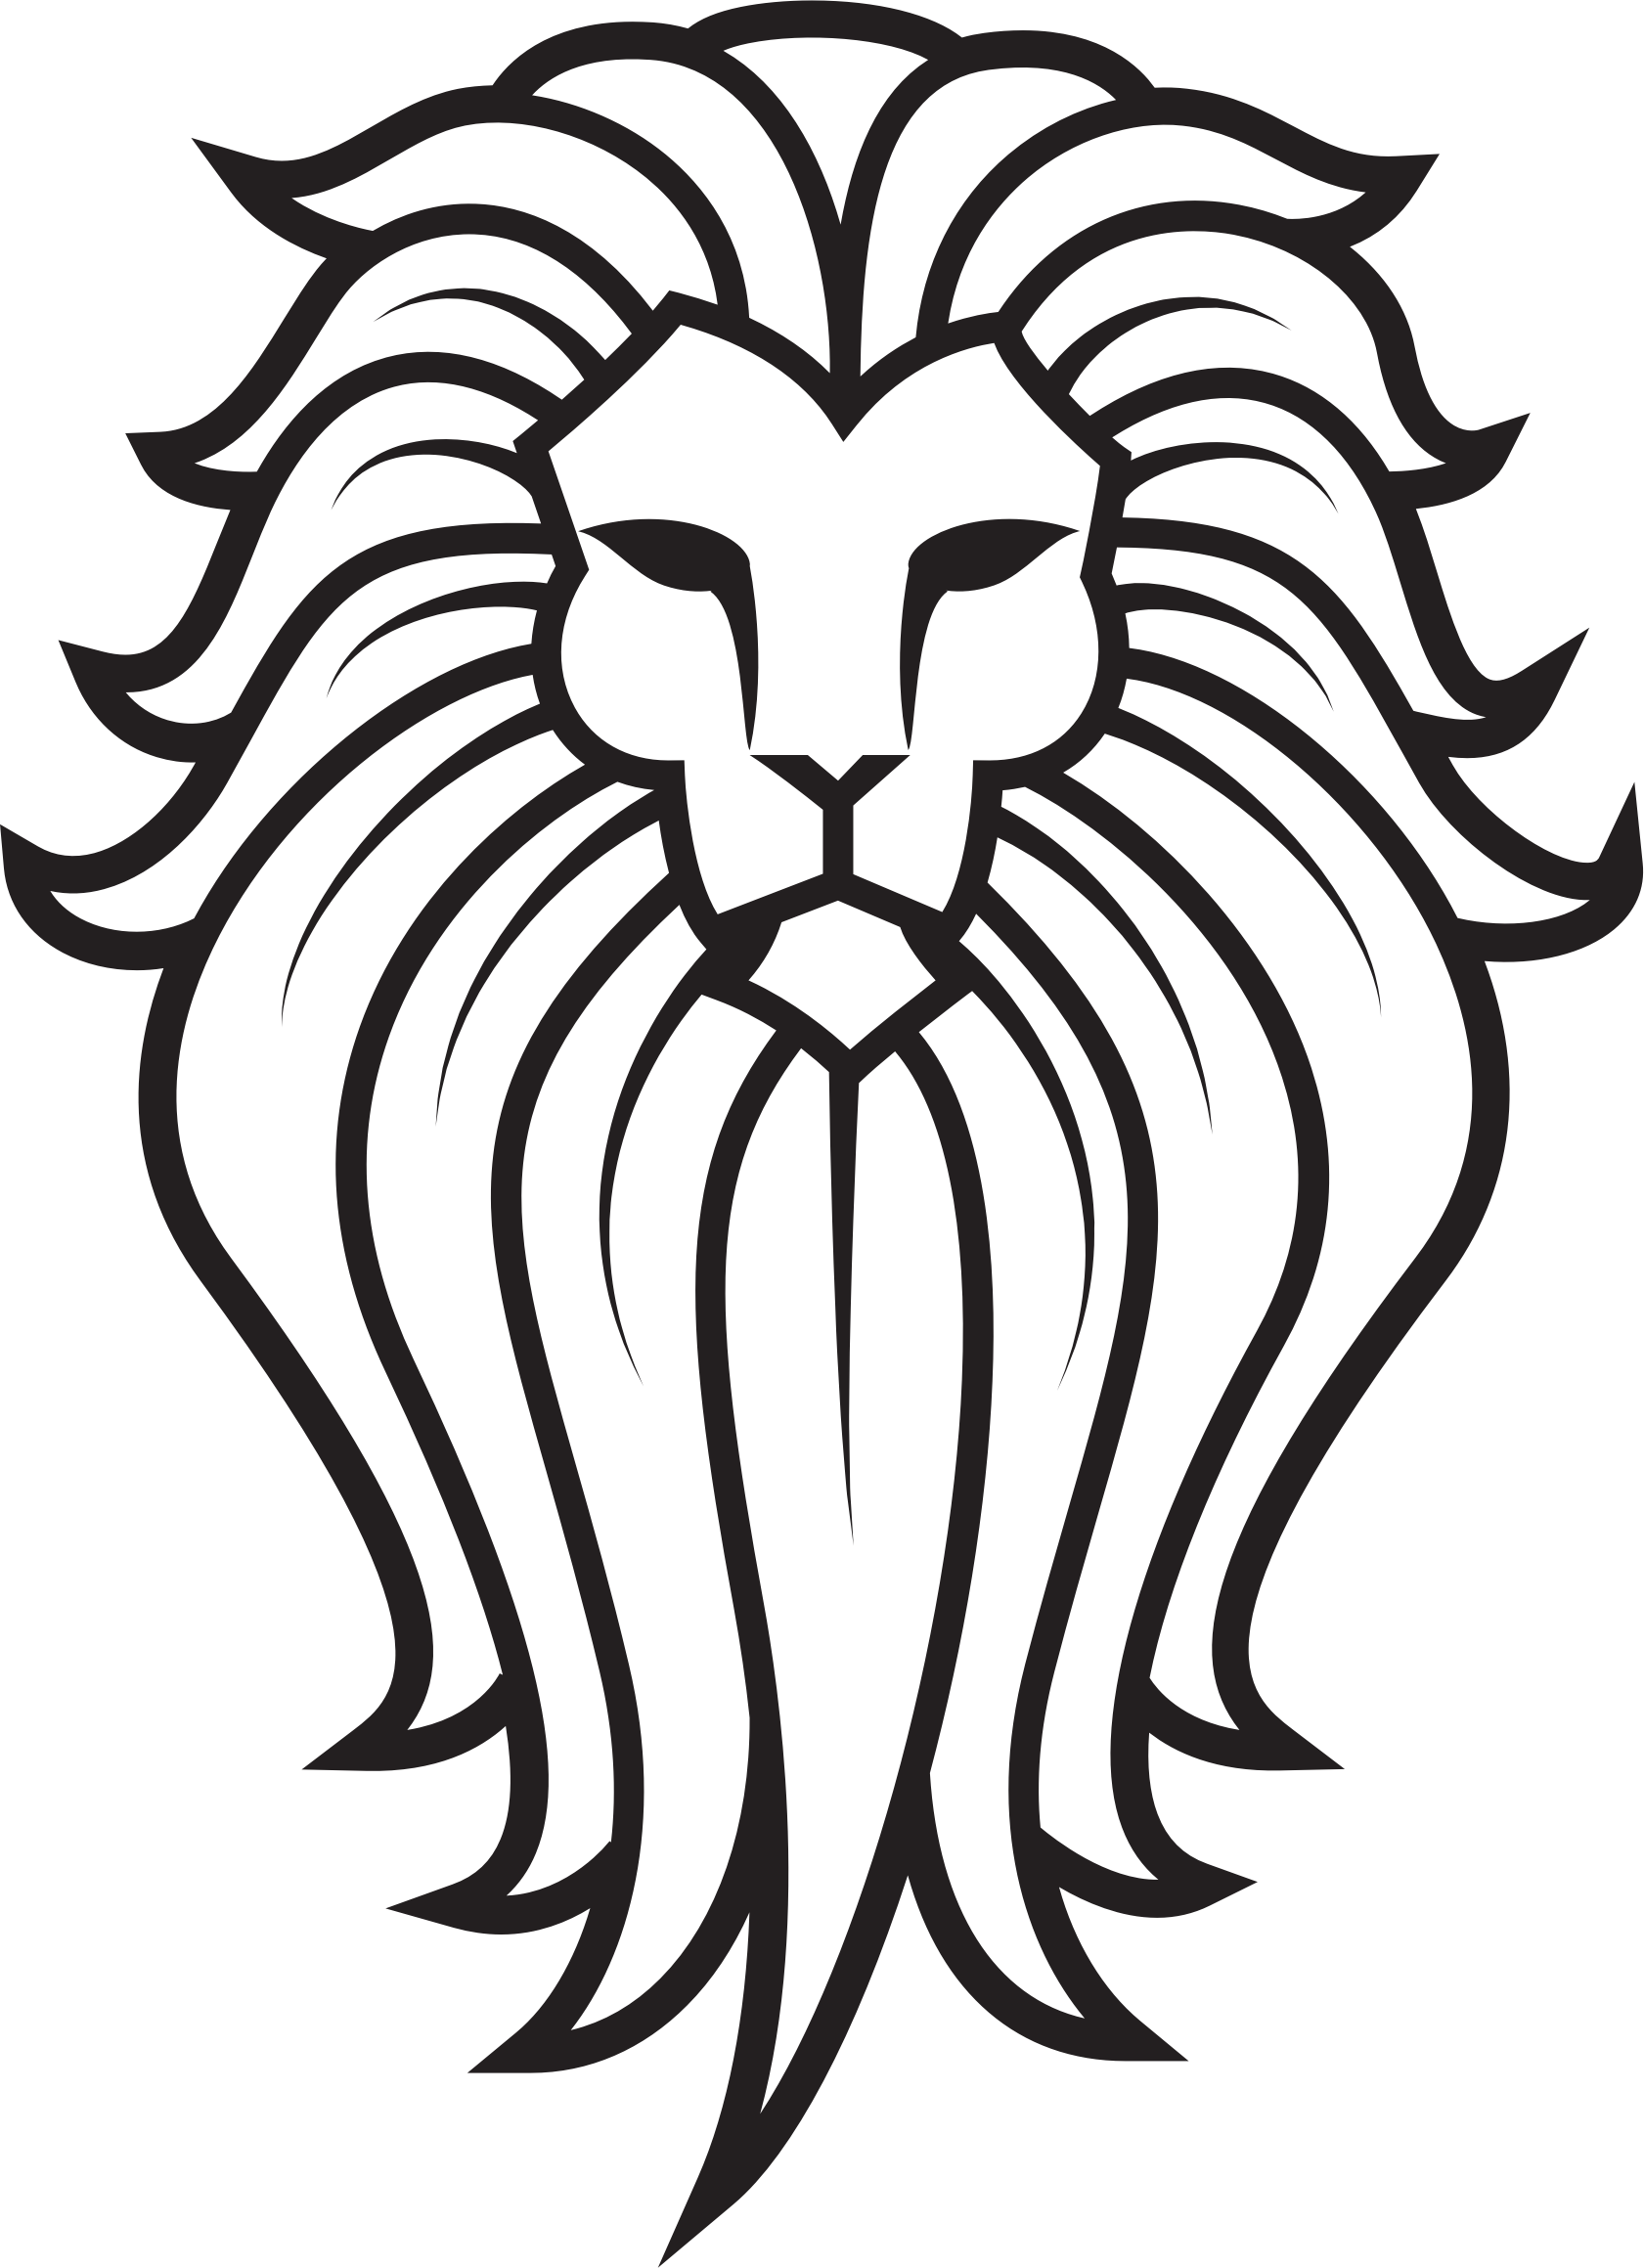 1681x2319 Large Lion Face Tattoo Transparent Png